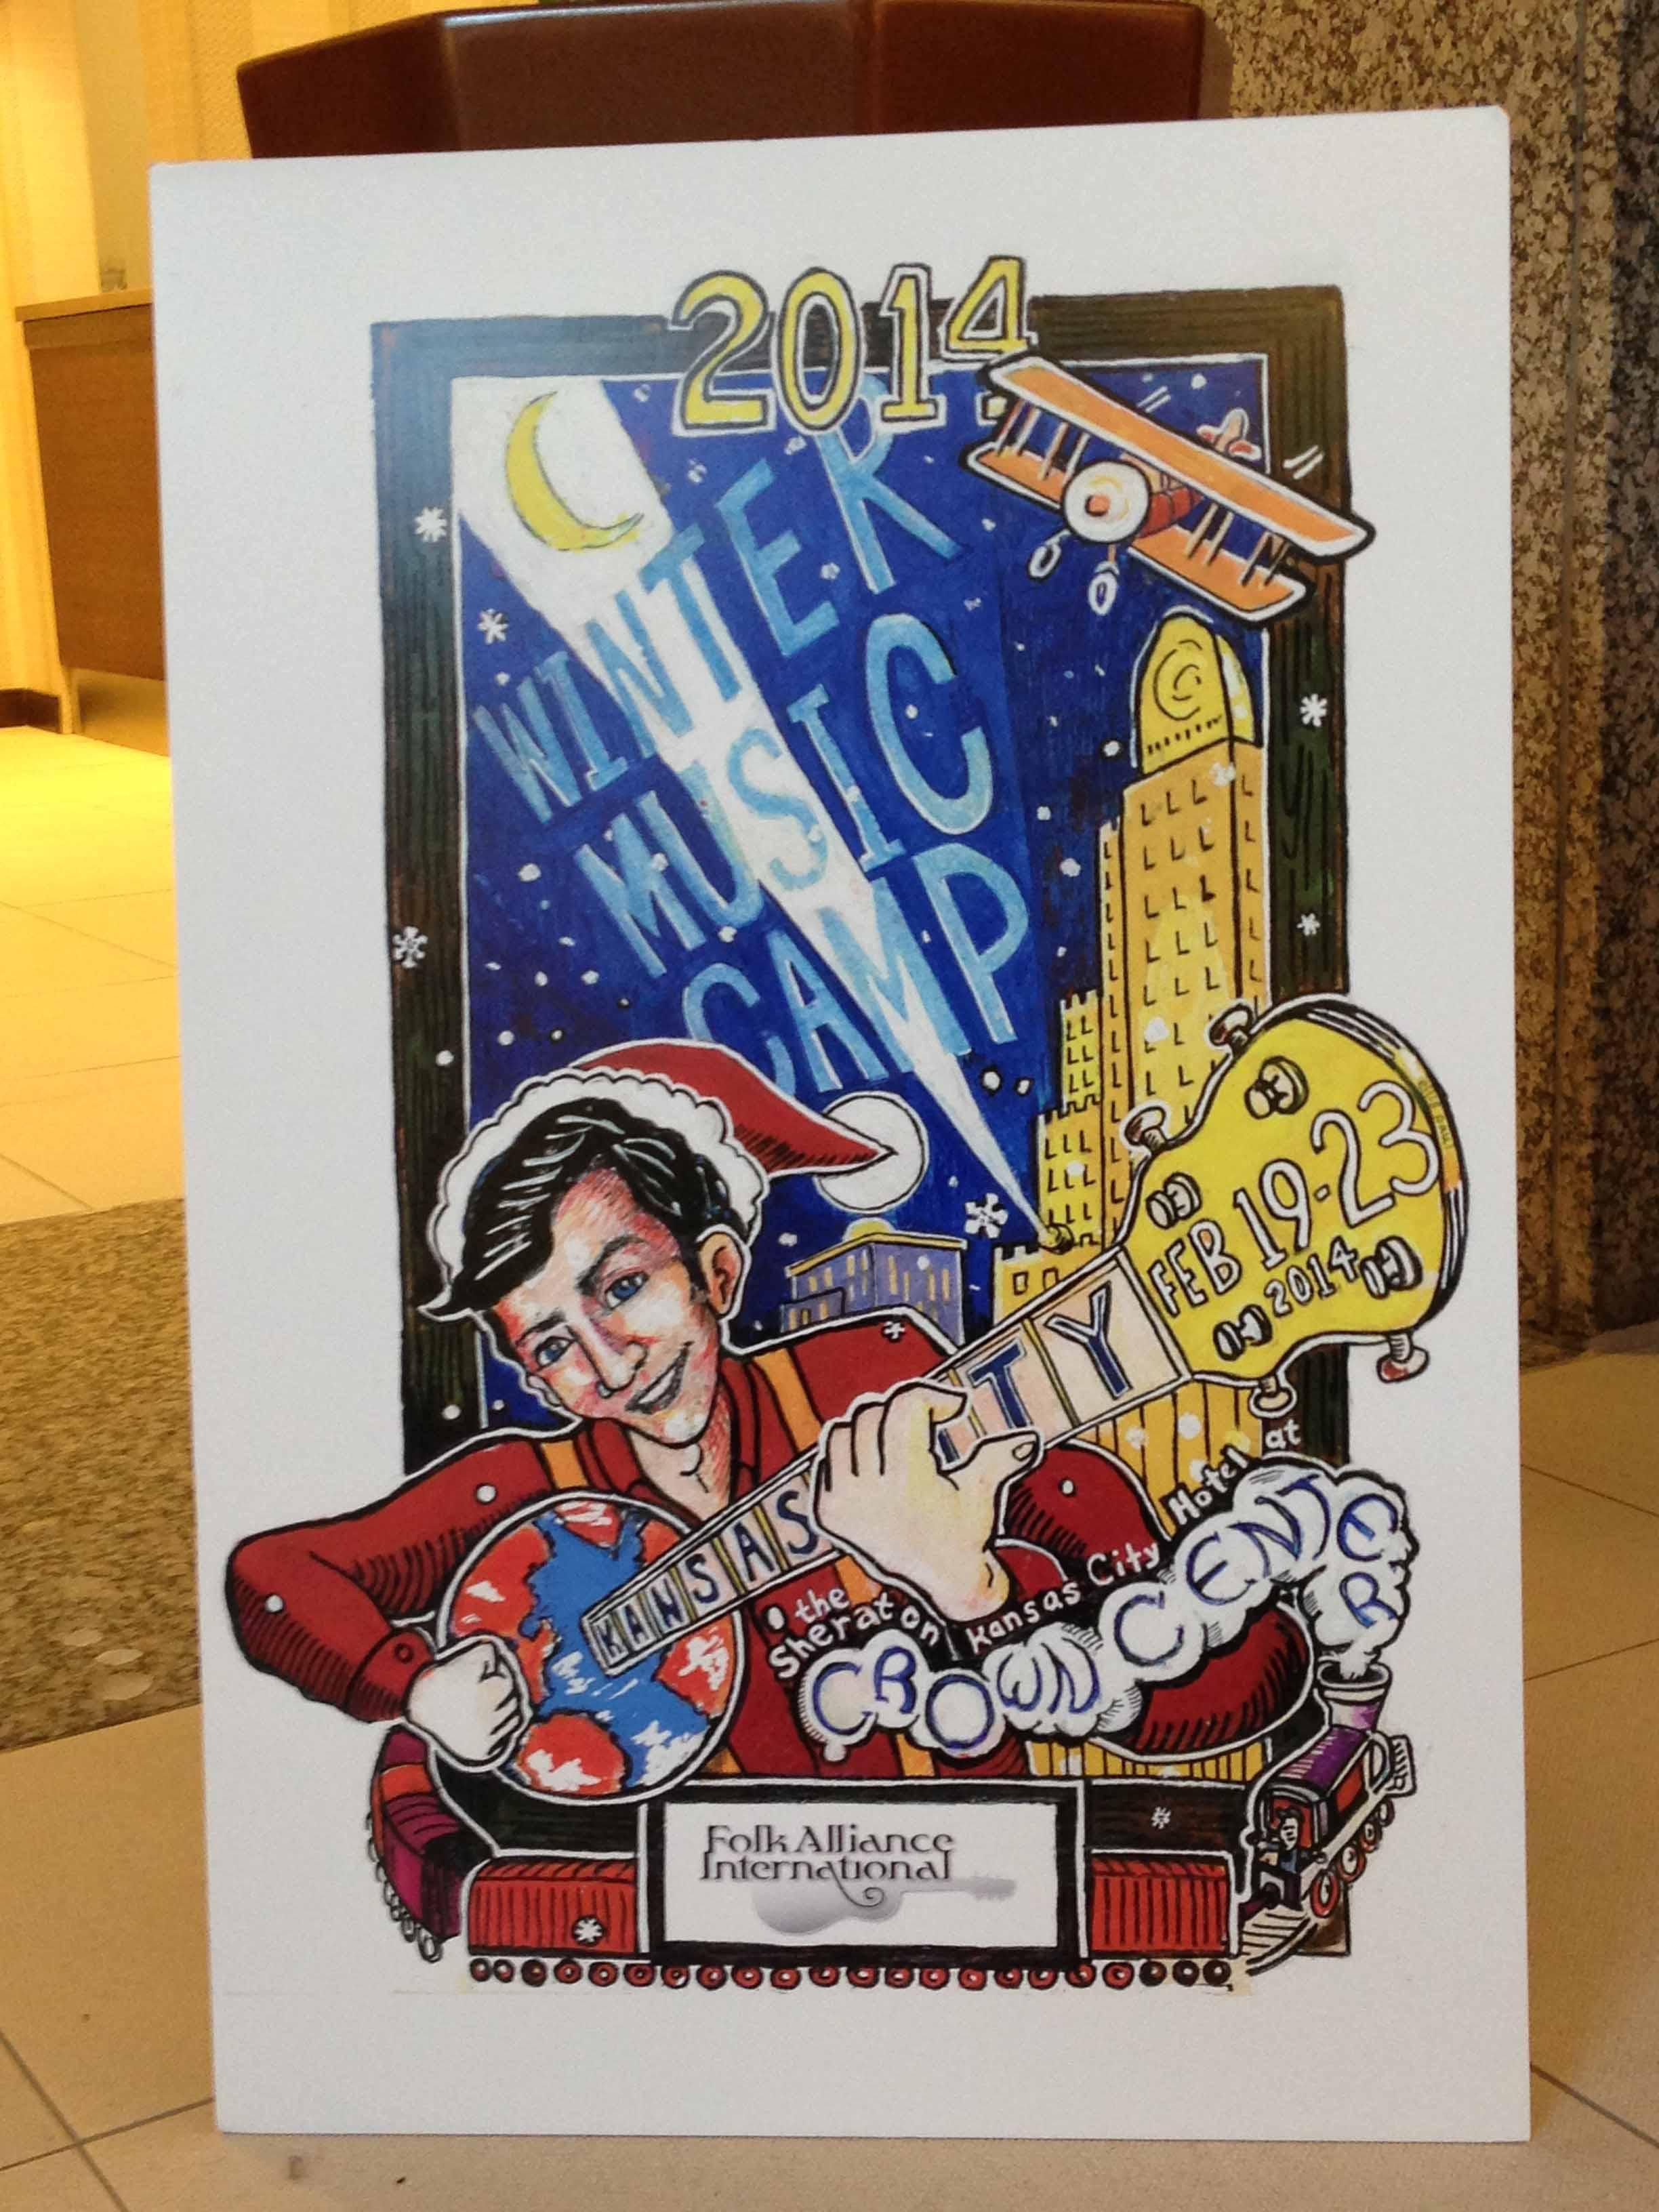 GUY DAVIS & FABRIZIO POGGI 2014 USA TOUR Folk Alliance Conference, Kansas City, Missouri